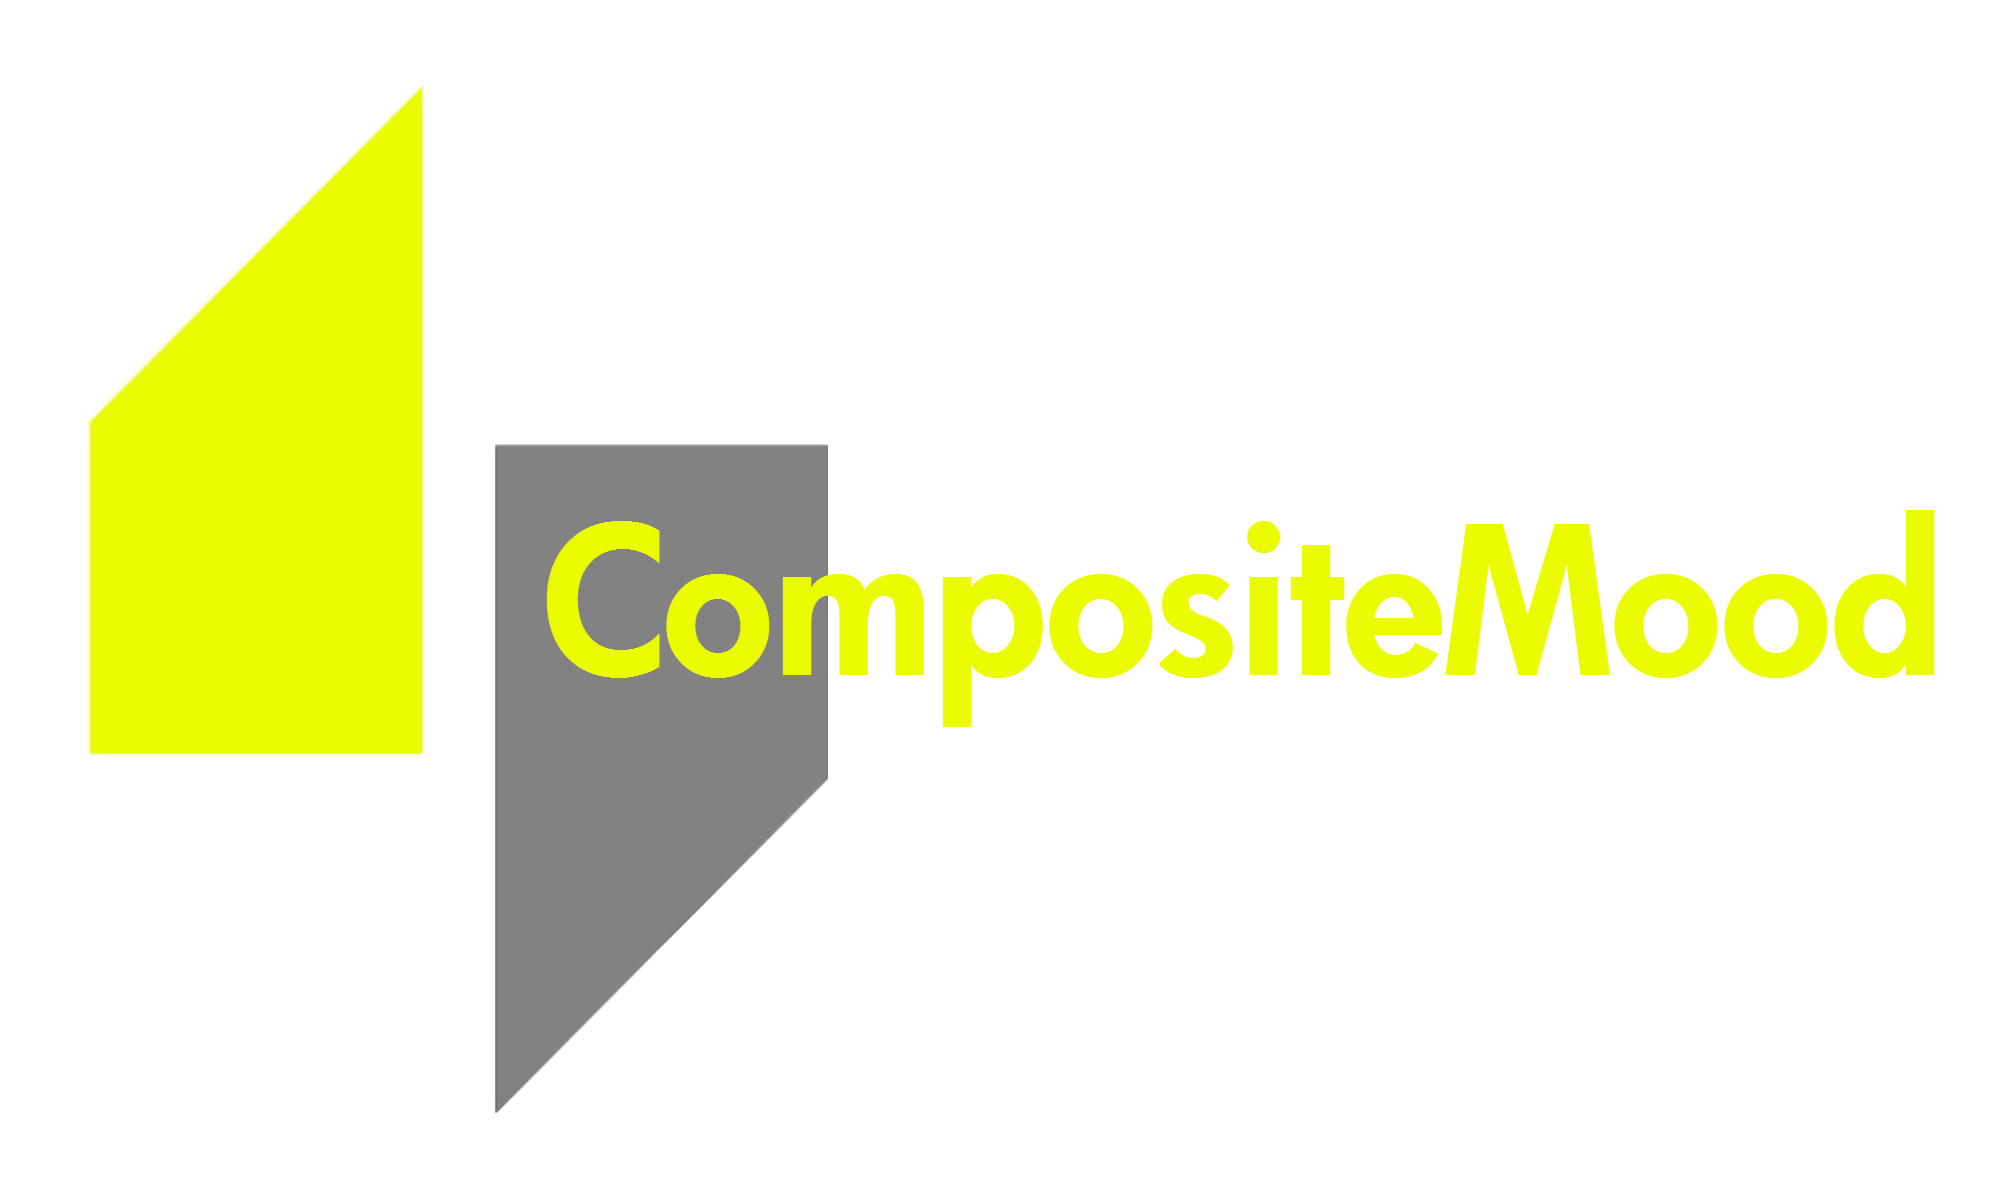 Composite Mood